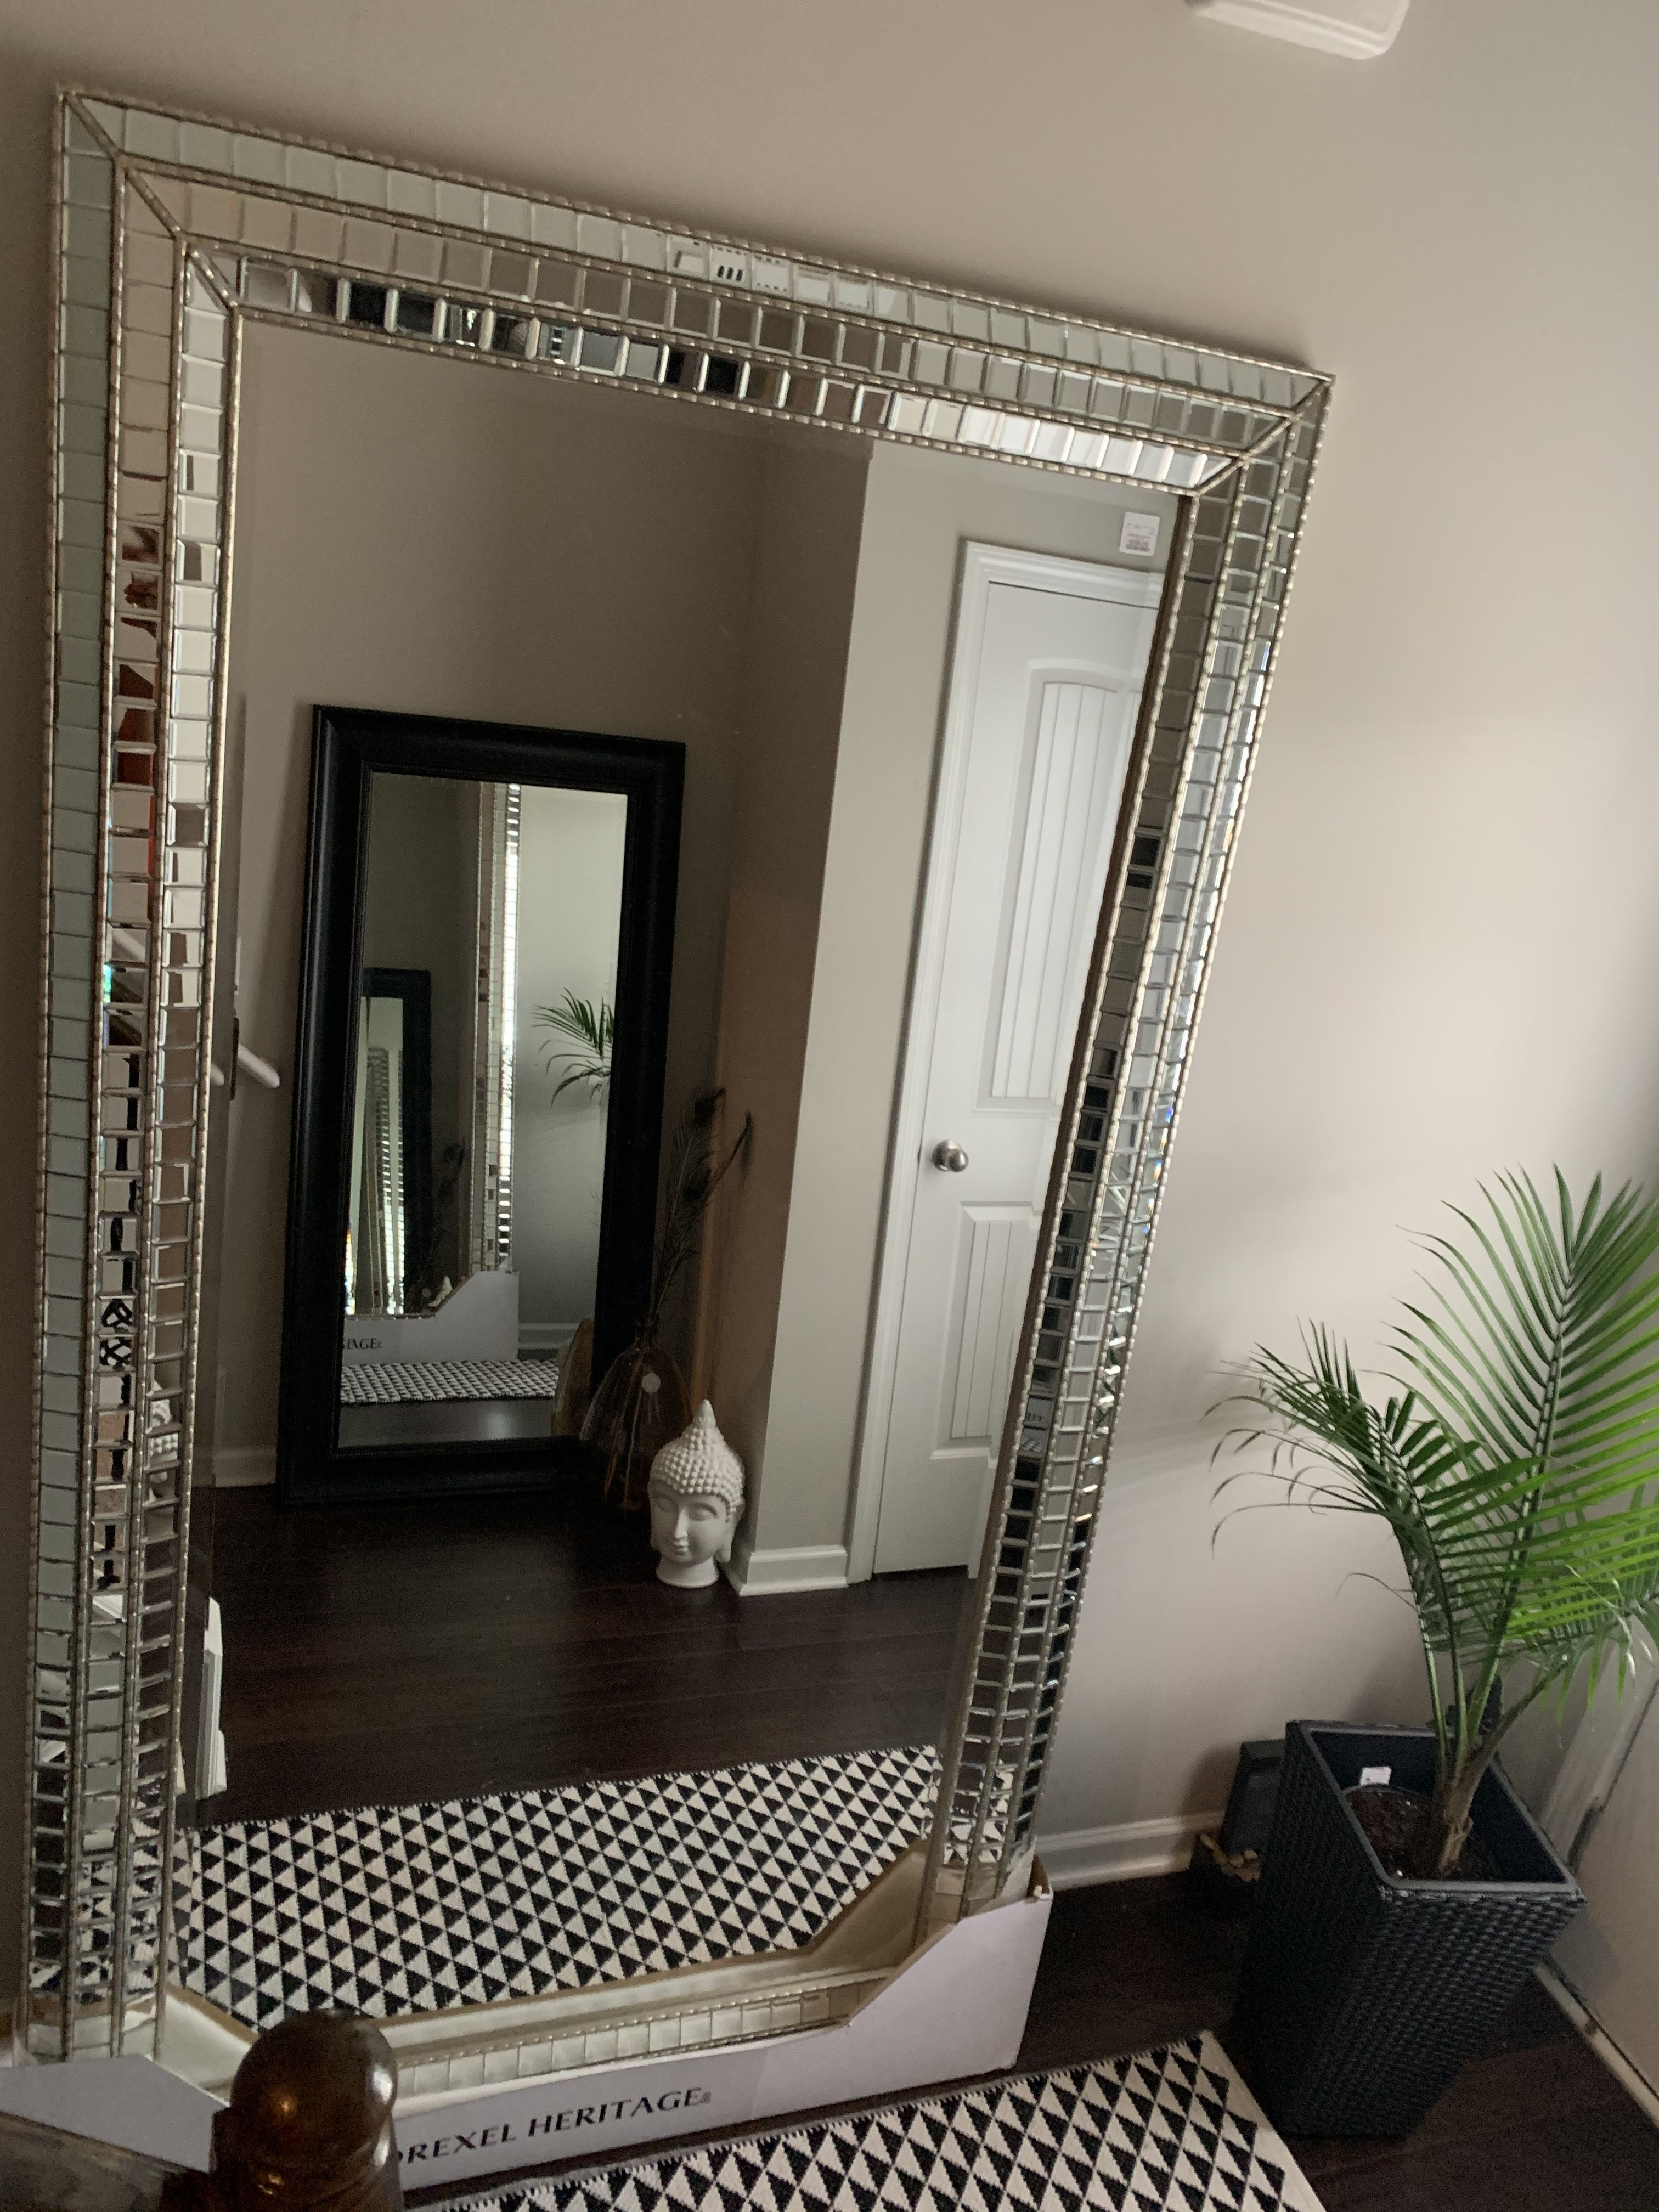 Drexel Heritage Large Floor Mirror From Home Goods So In Loveeee Floor Mirror Living Room Oversized Floor Mirror Large Floor Mirror